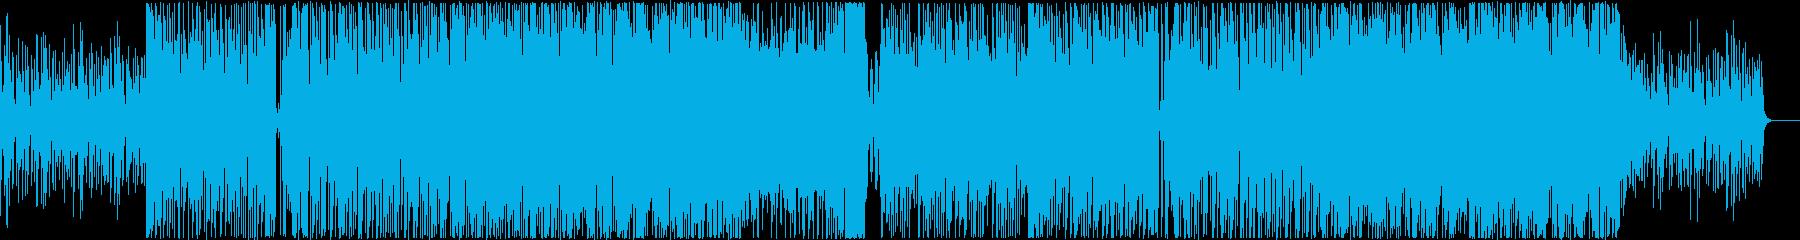 EDM系 キャッチーでノリが良い曲 -8の再生済みの波形